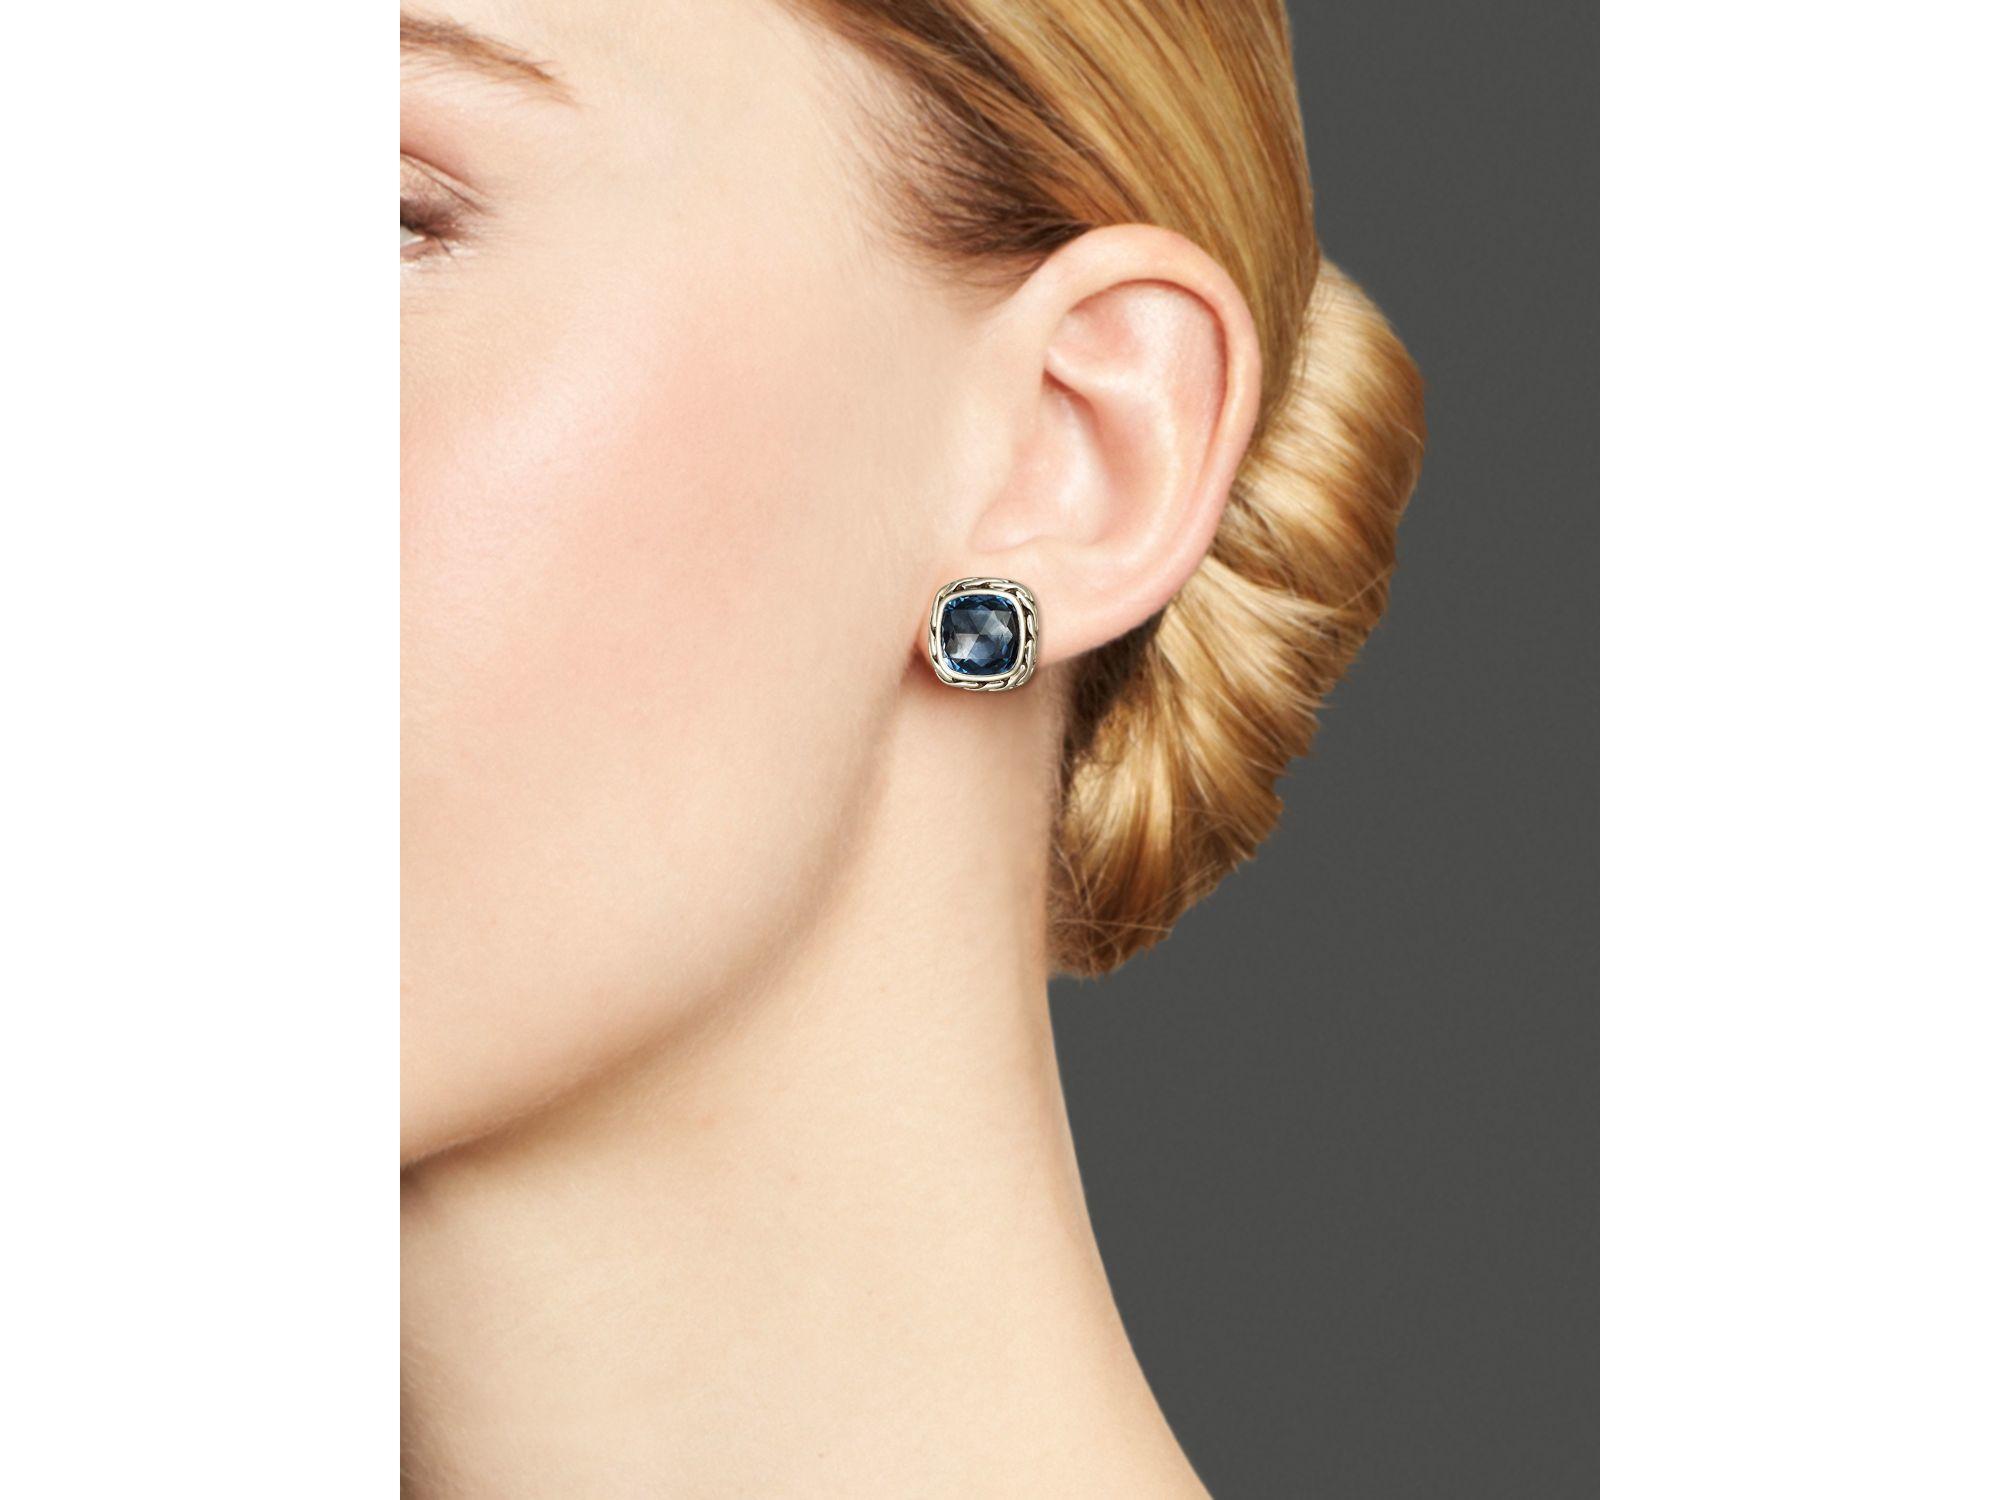 John hardy Classic Chain Stud Earrings With London Blue Topaz in